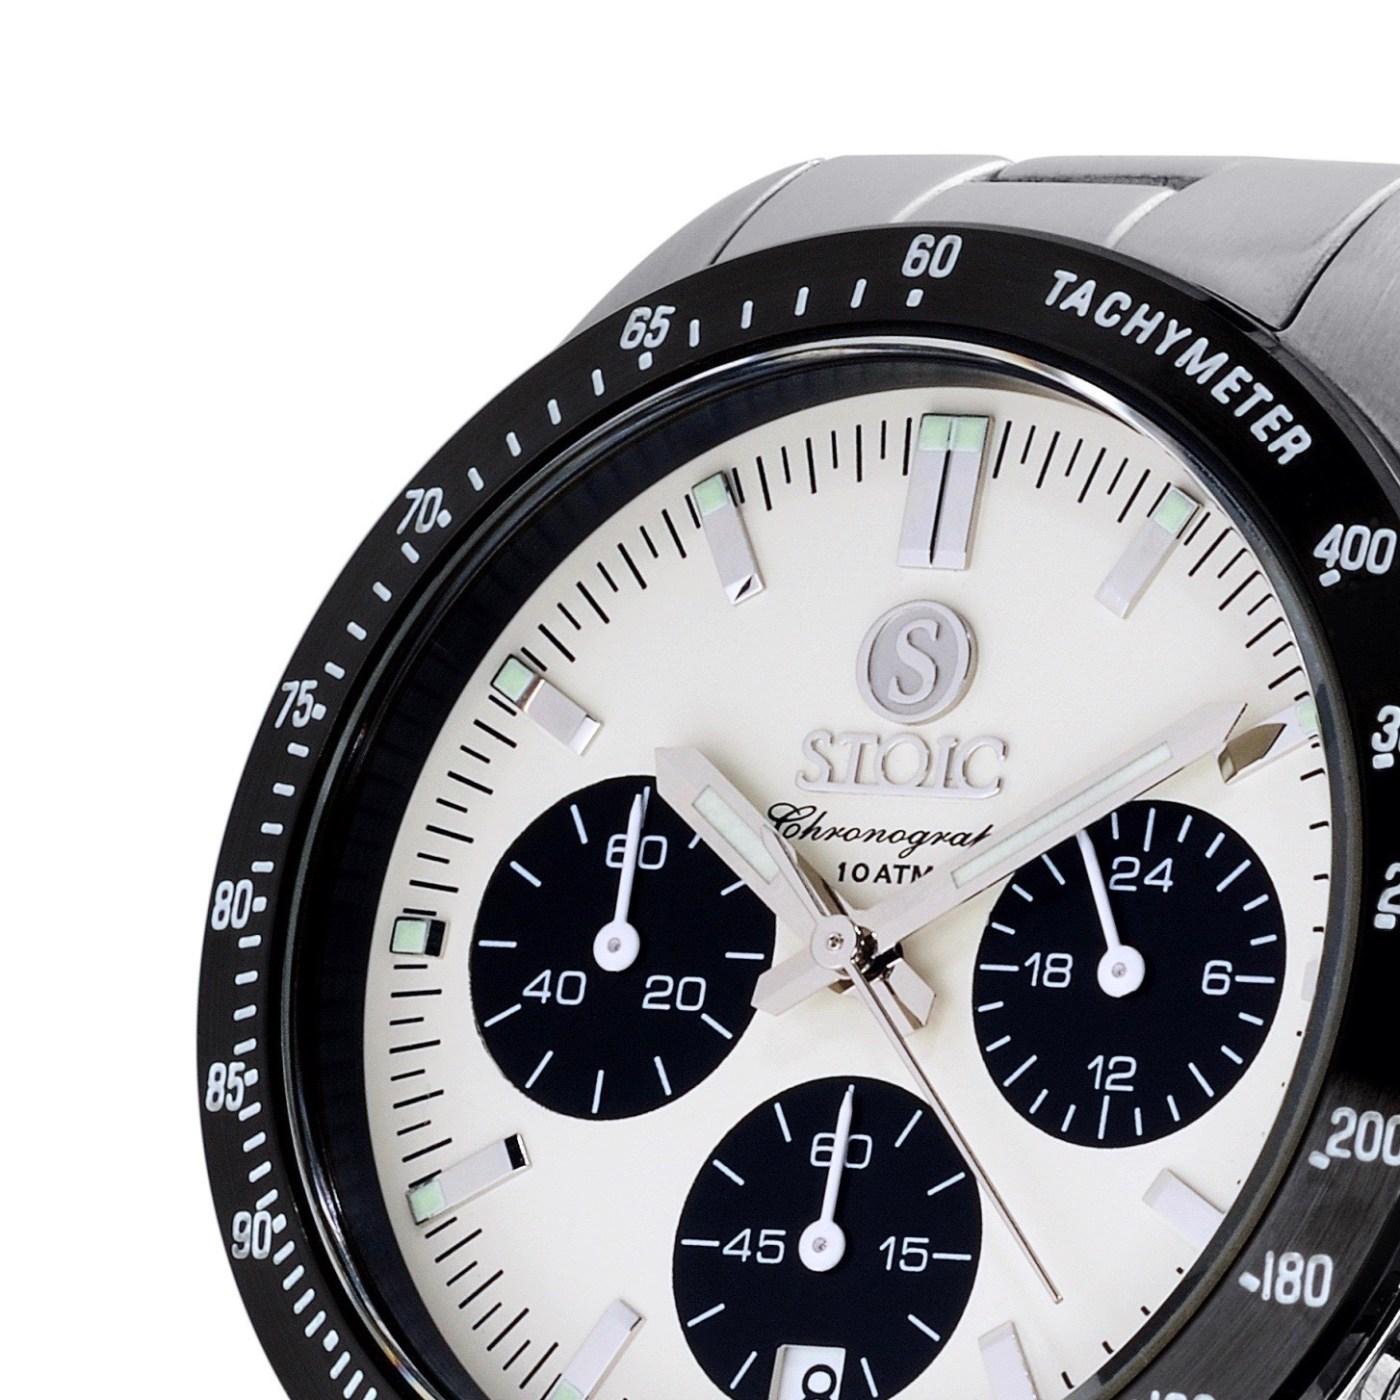 Stoic Chronograph dial detail